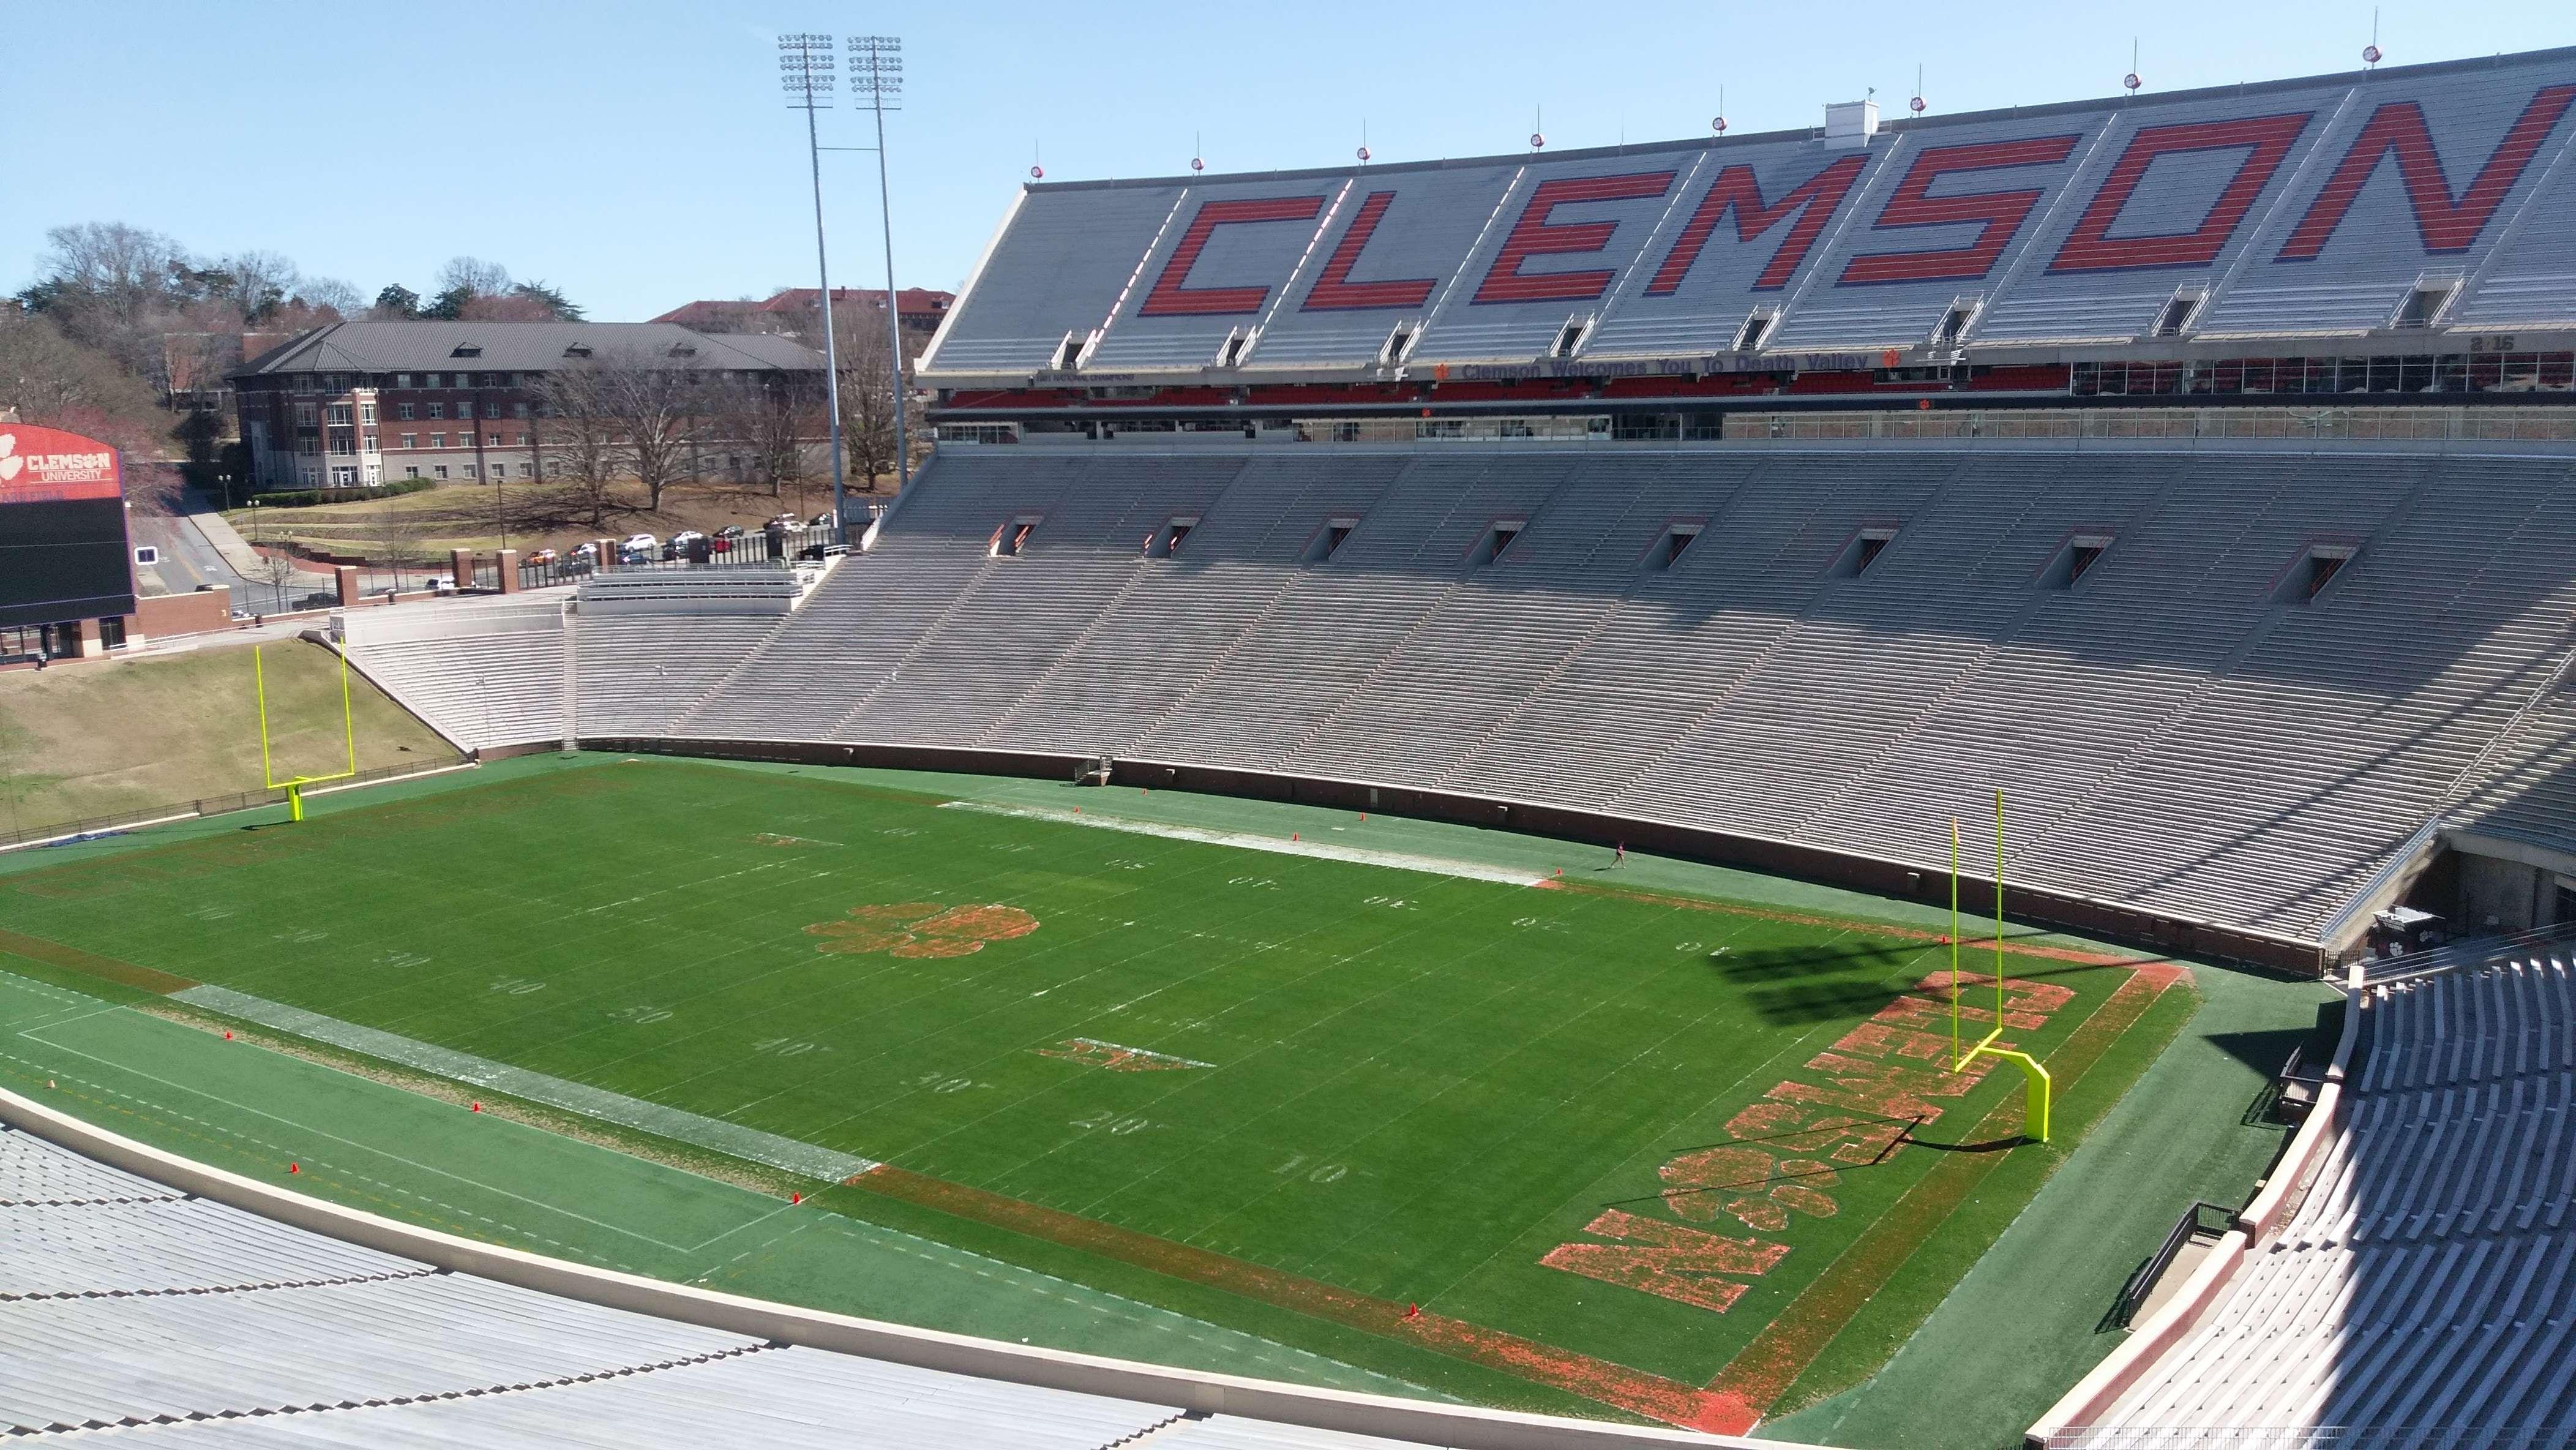 Clemson football stadium